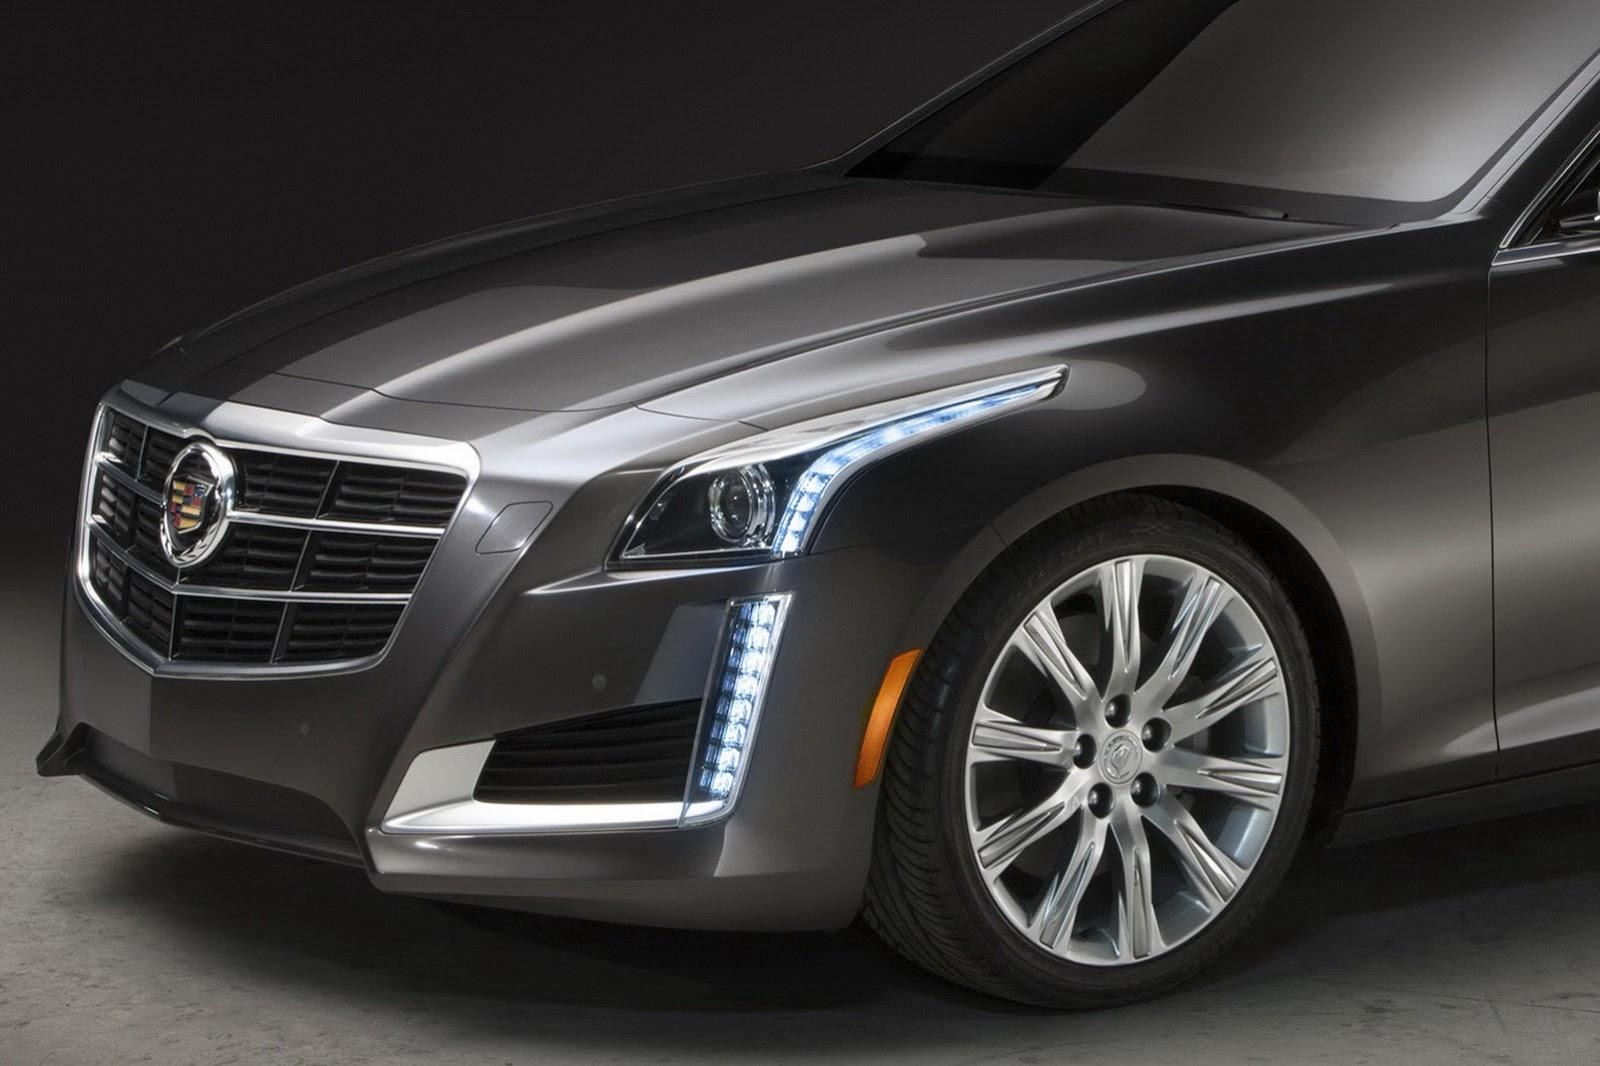 Cadillac Explains Its New Aggressive Headlight Design Autoevolution